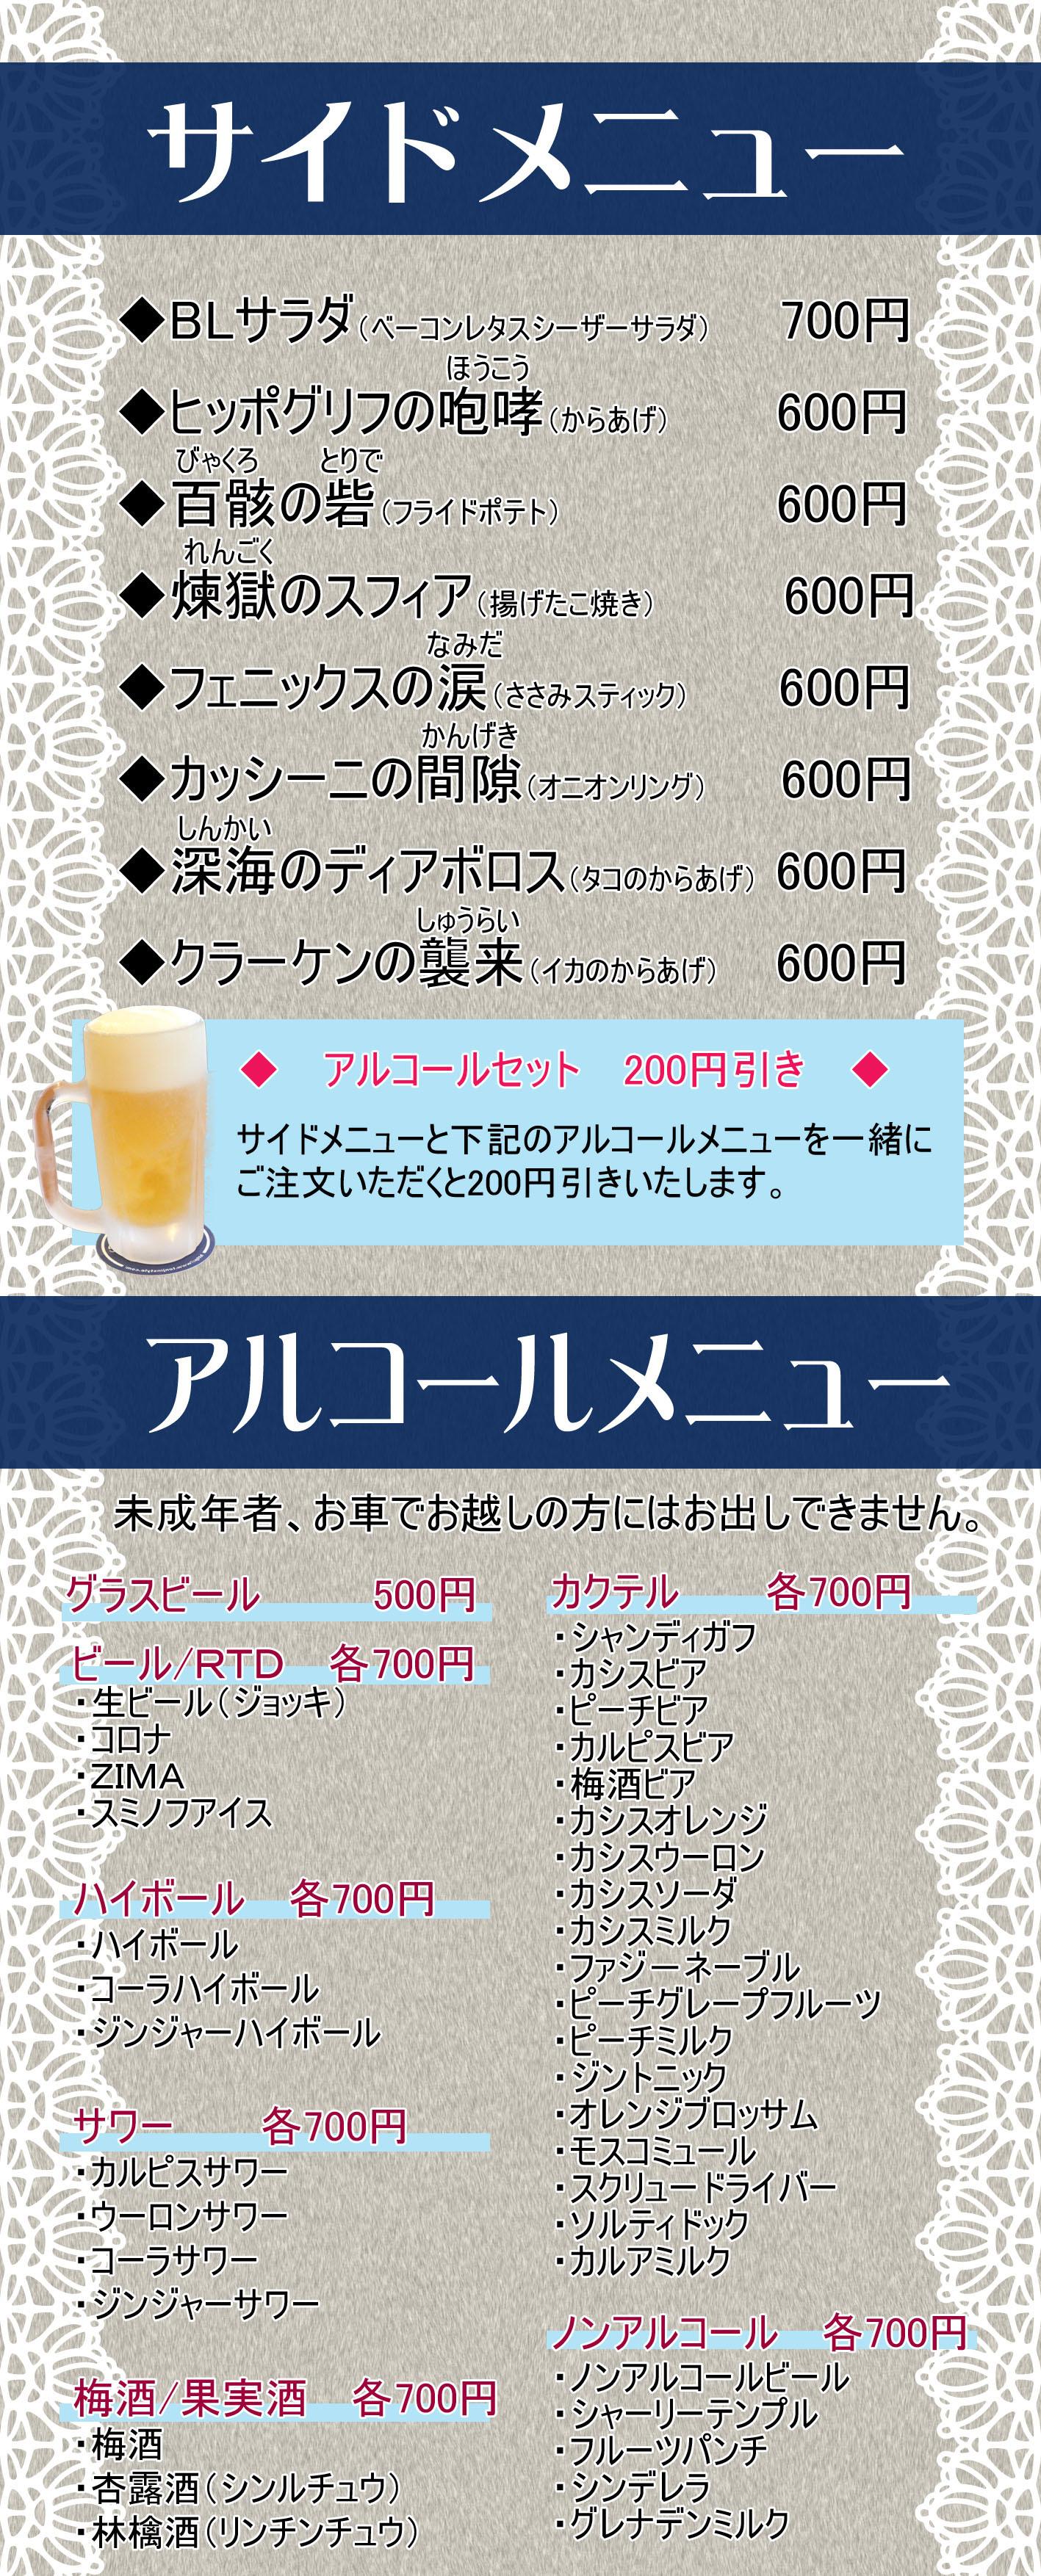 BLメニュー⑥ サイド・アルコールメニューのコピー